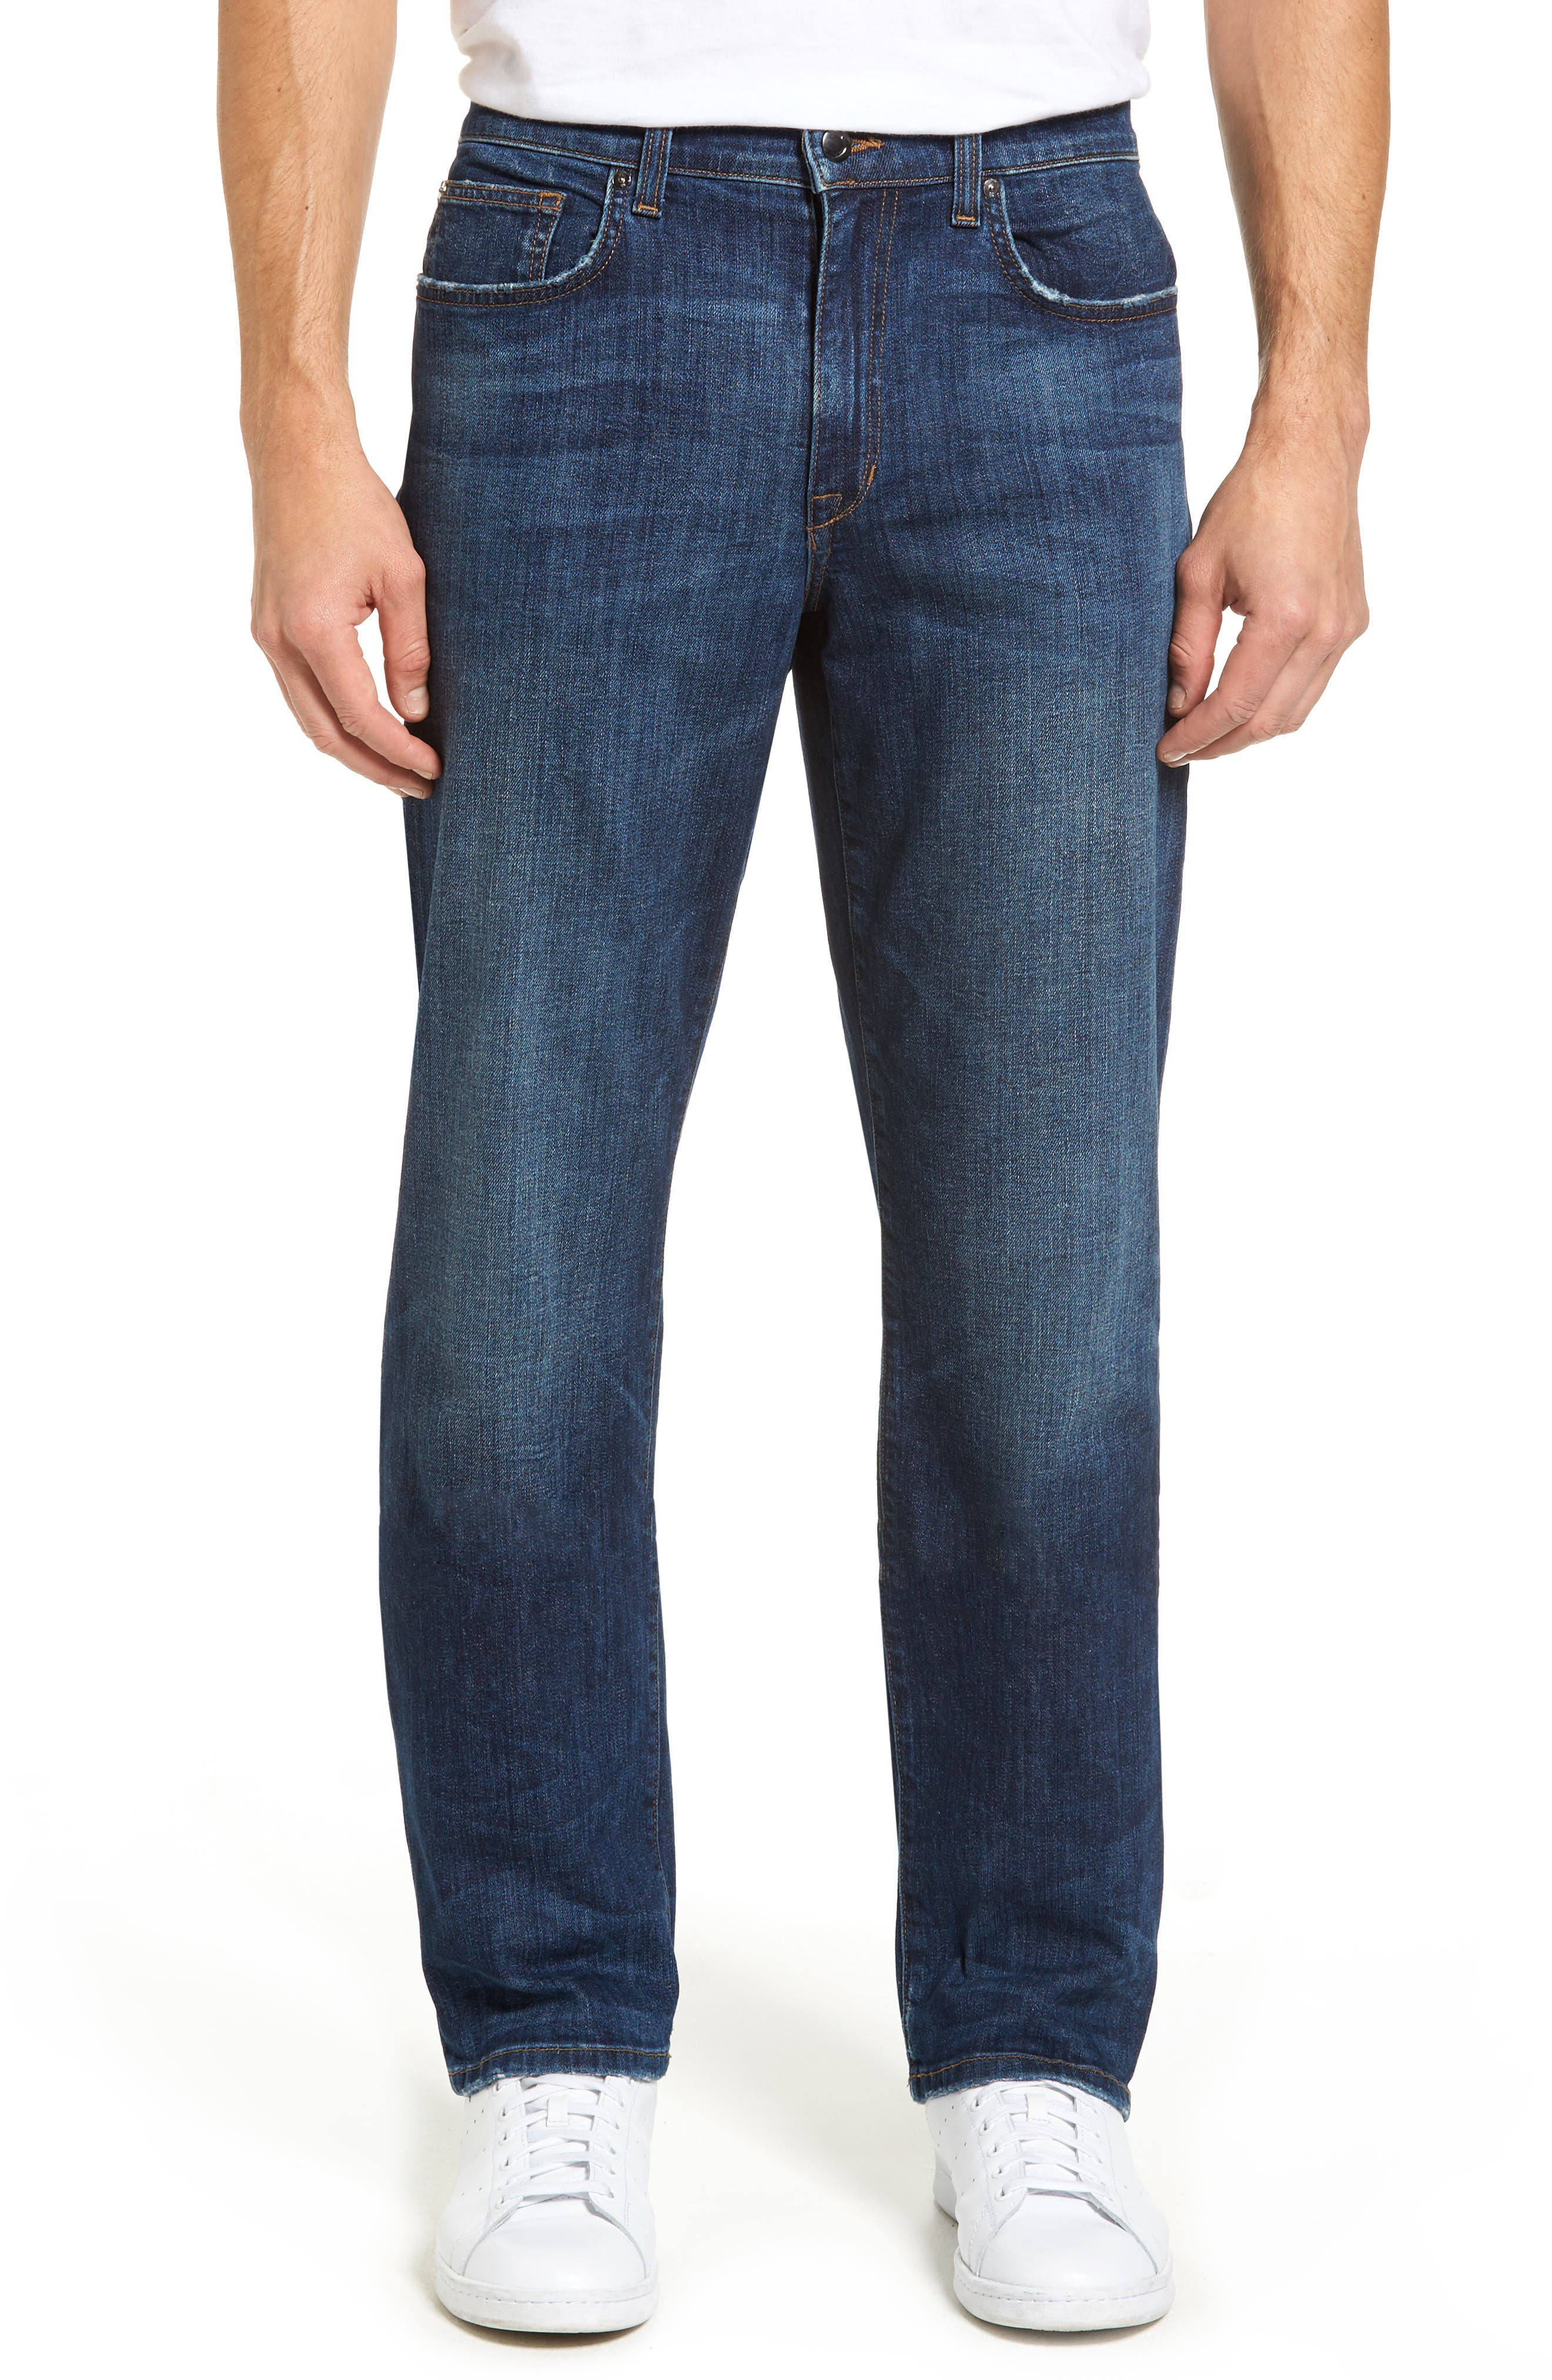 Alternate Image 1 Selected - Joe's Classic Straight Fit Jeans (Vizzini)